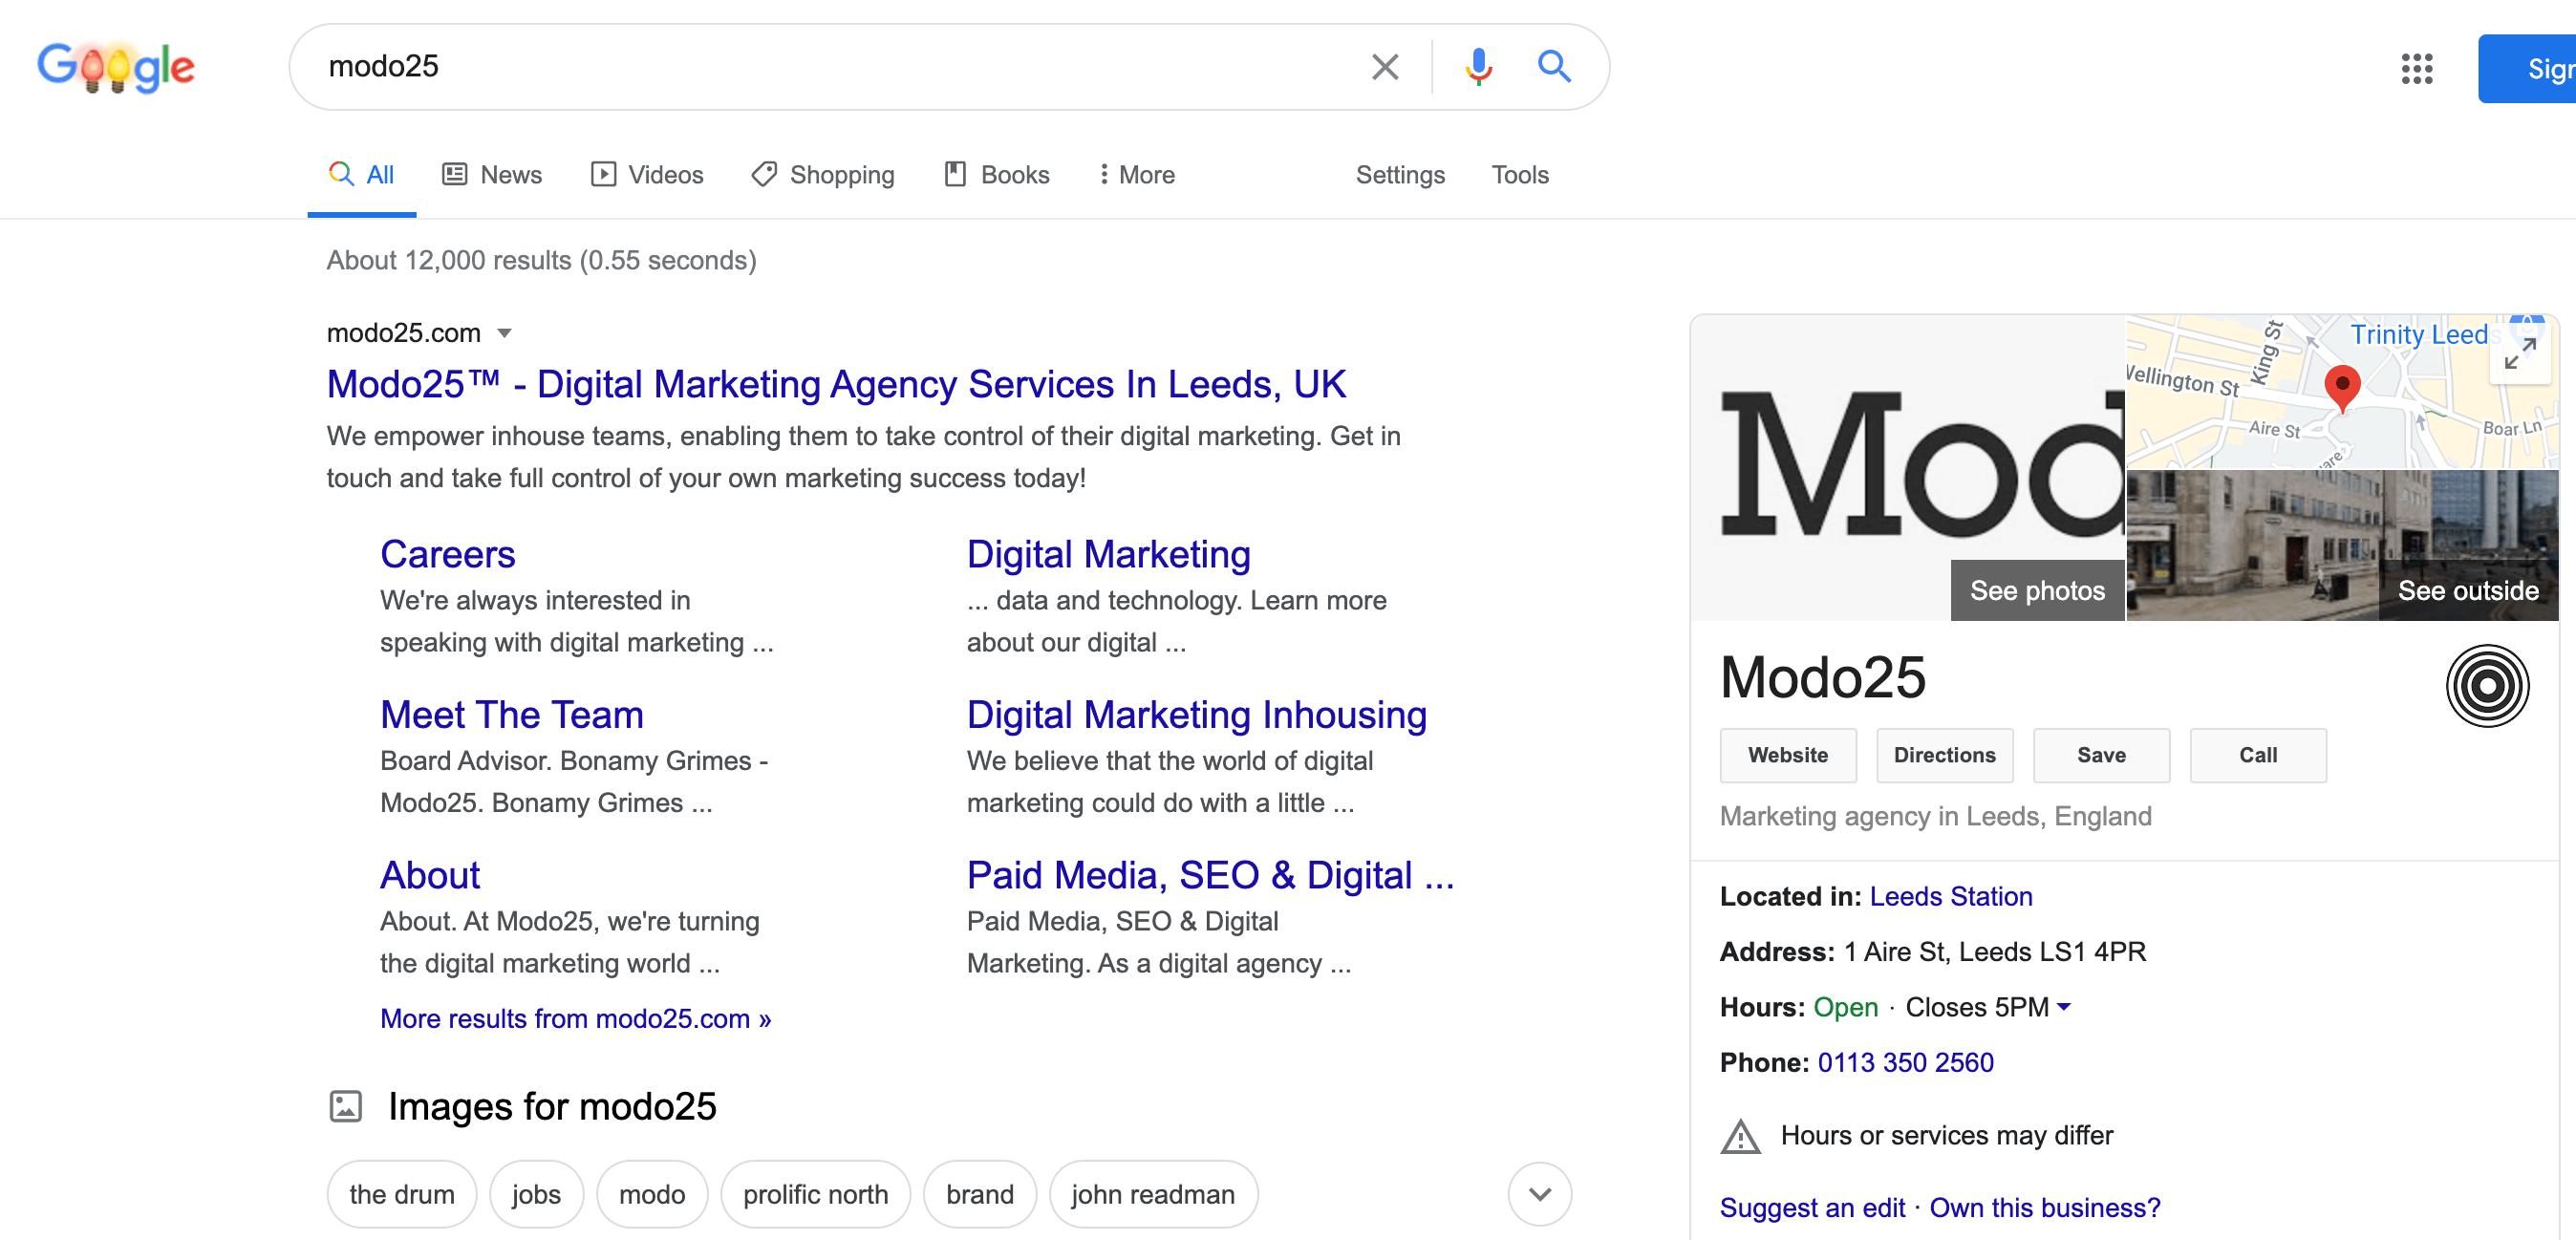 Modo25 Google business profile in SERP